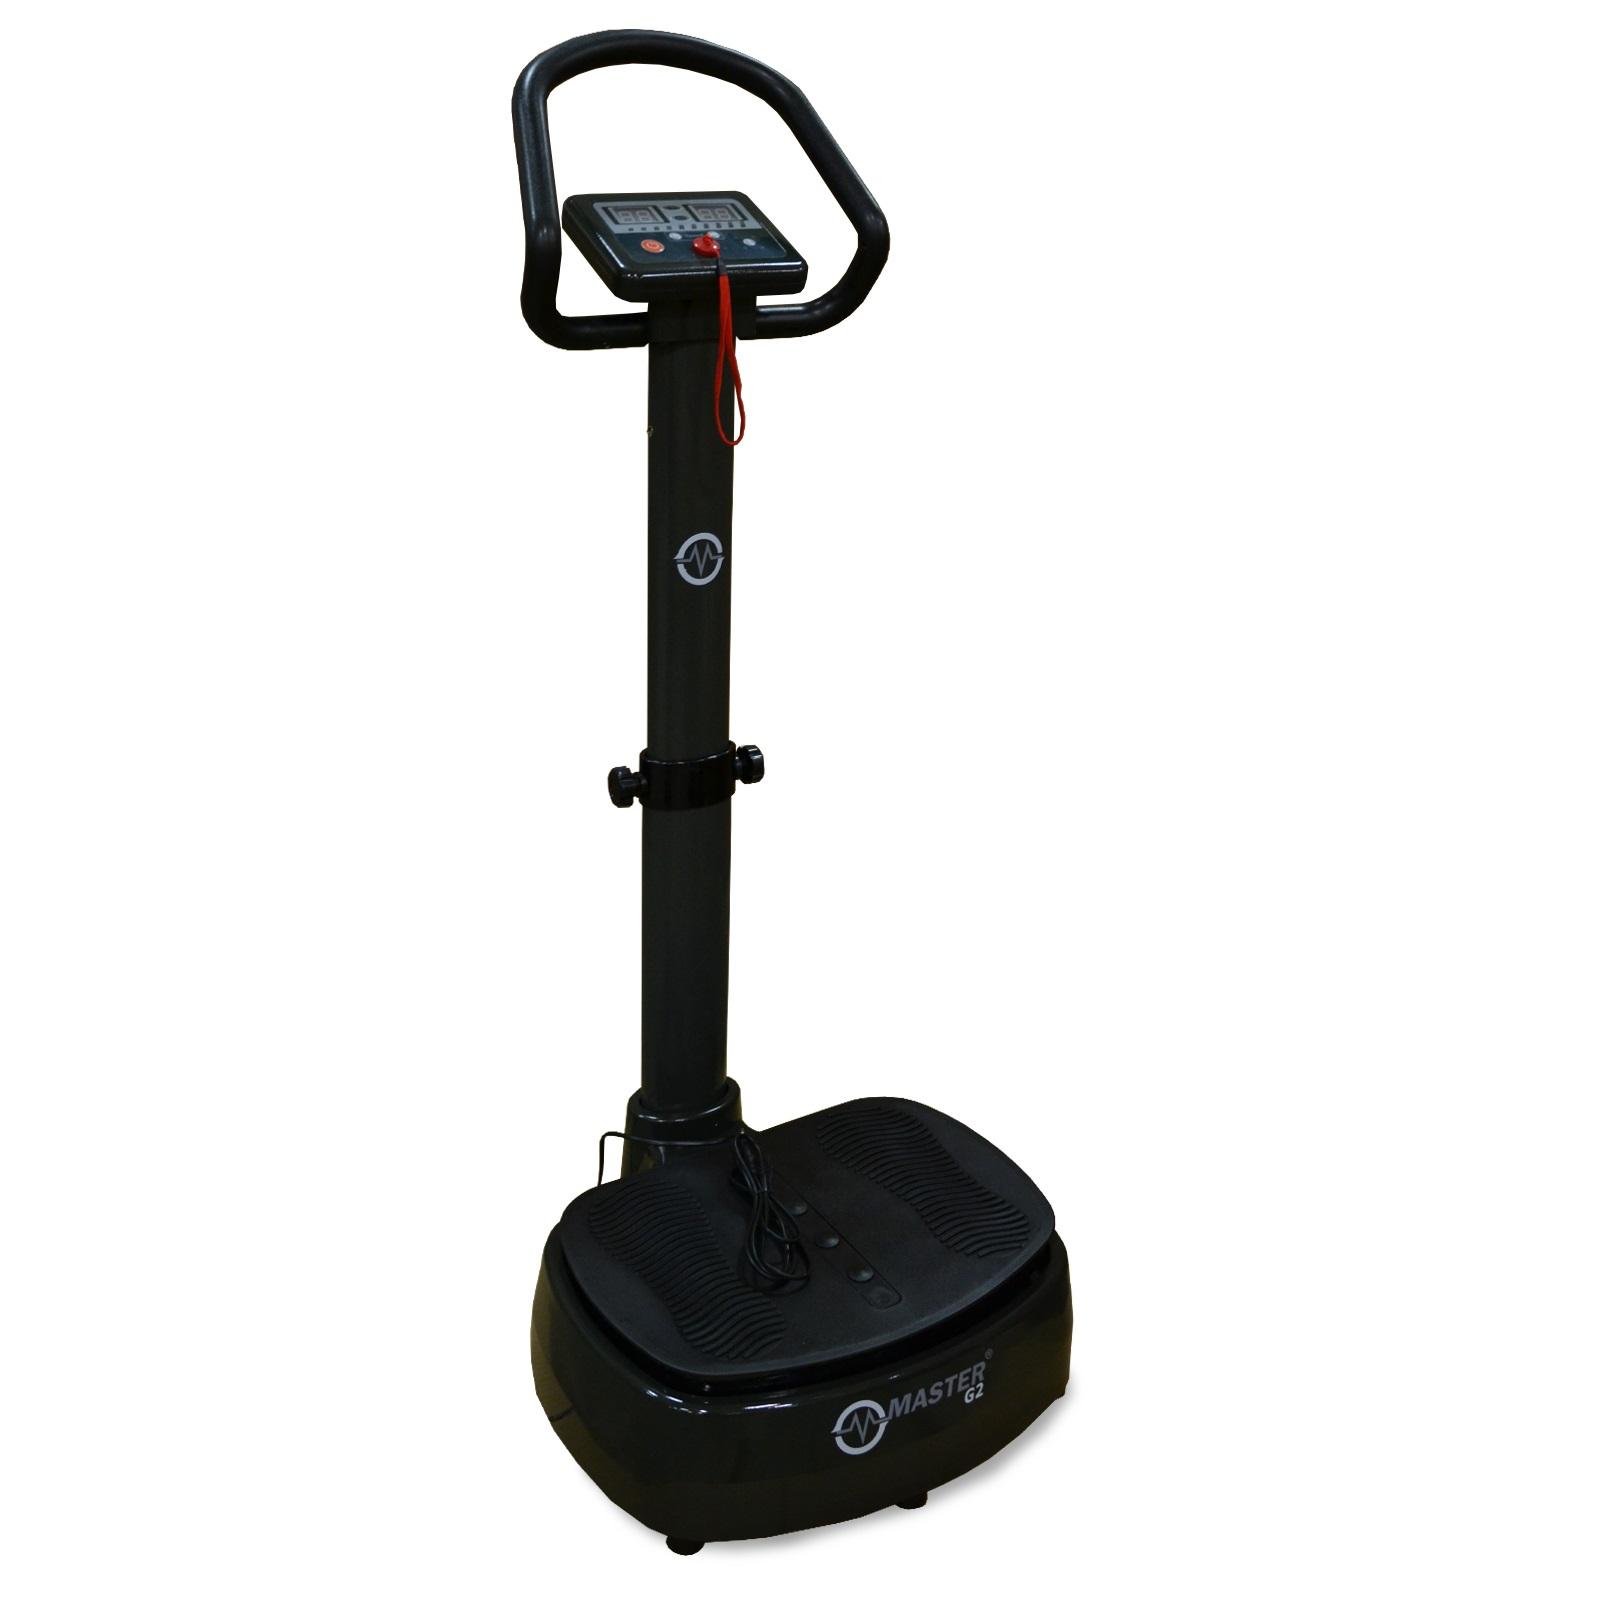 Vibračný posilňovací stroj MASTER - G2